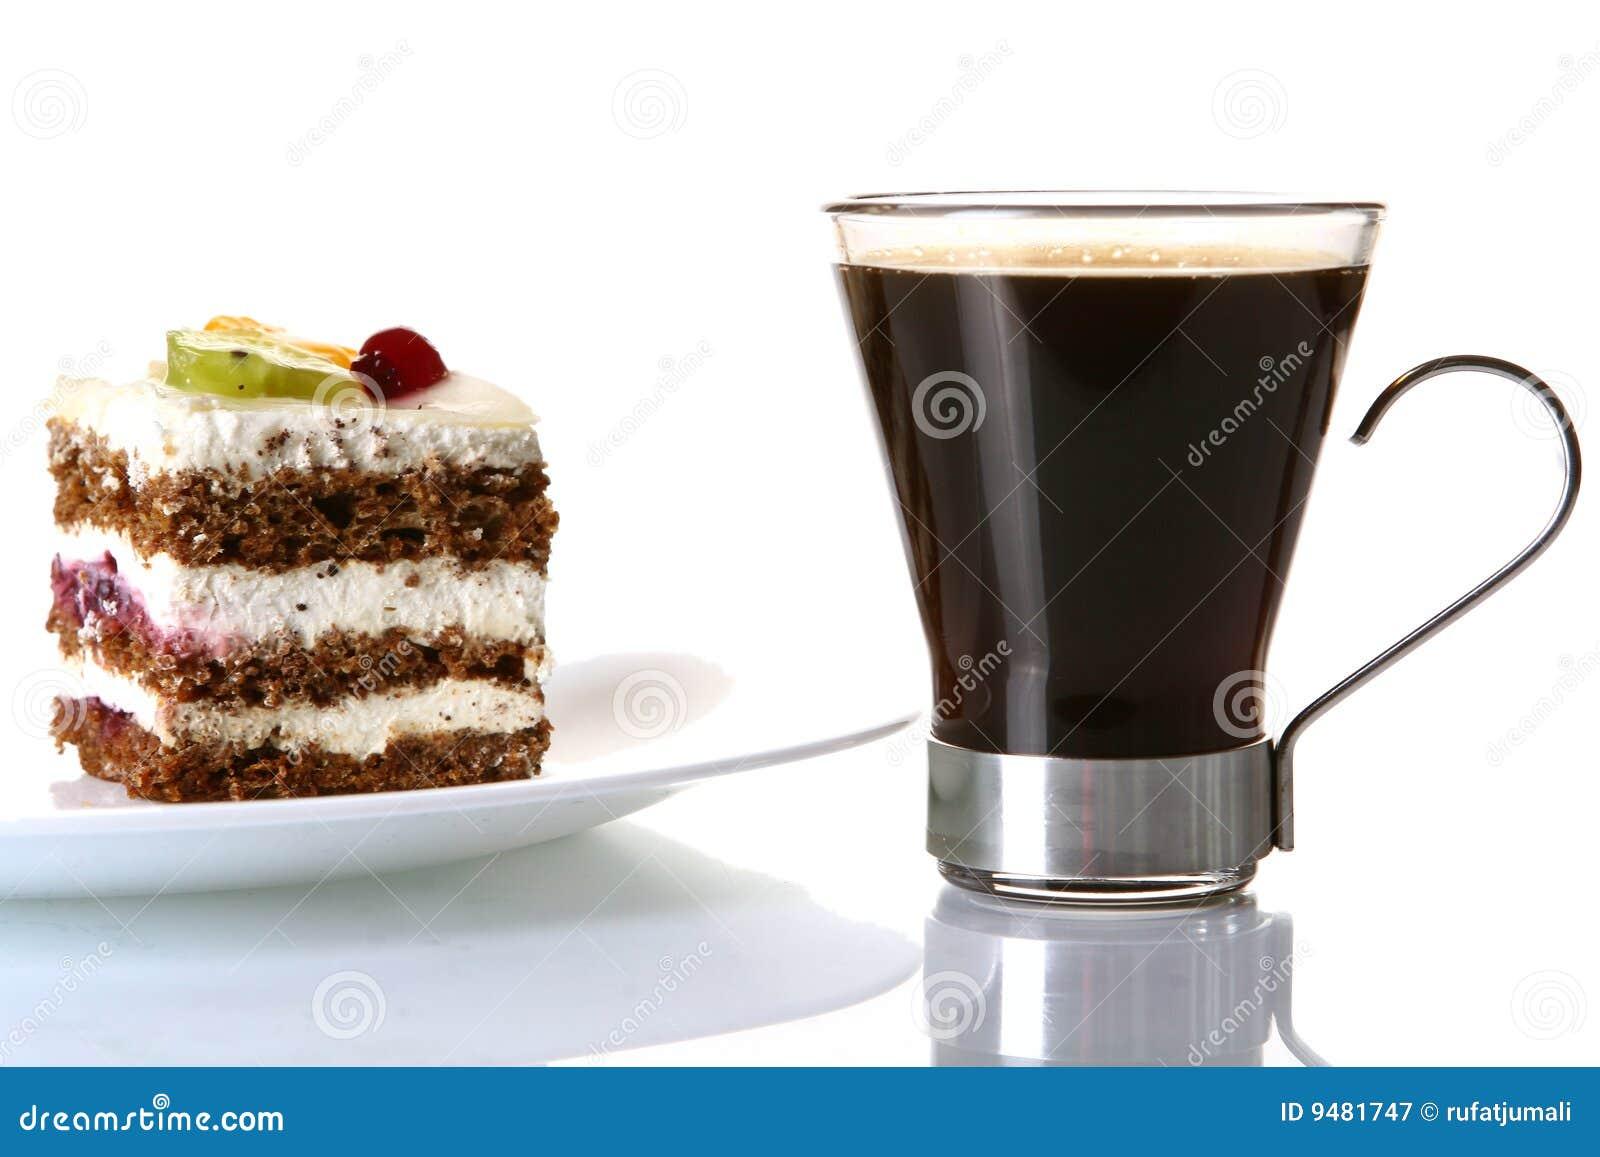 Dessert Fruit Cake With Black Coffee Breakfast Design